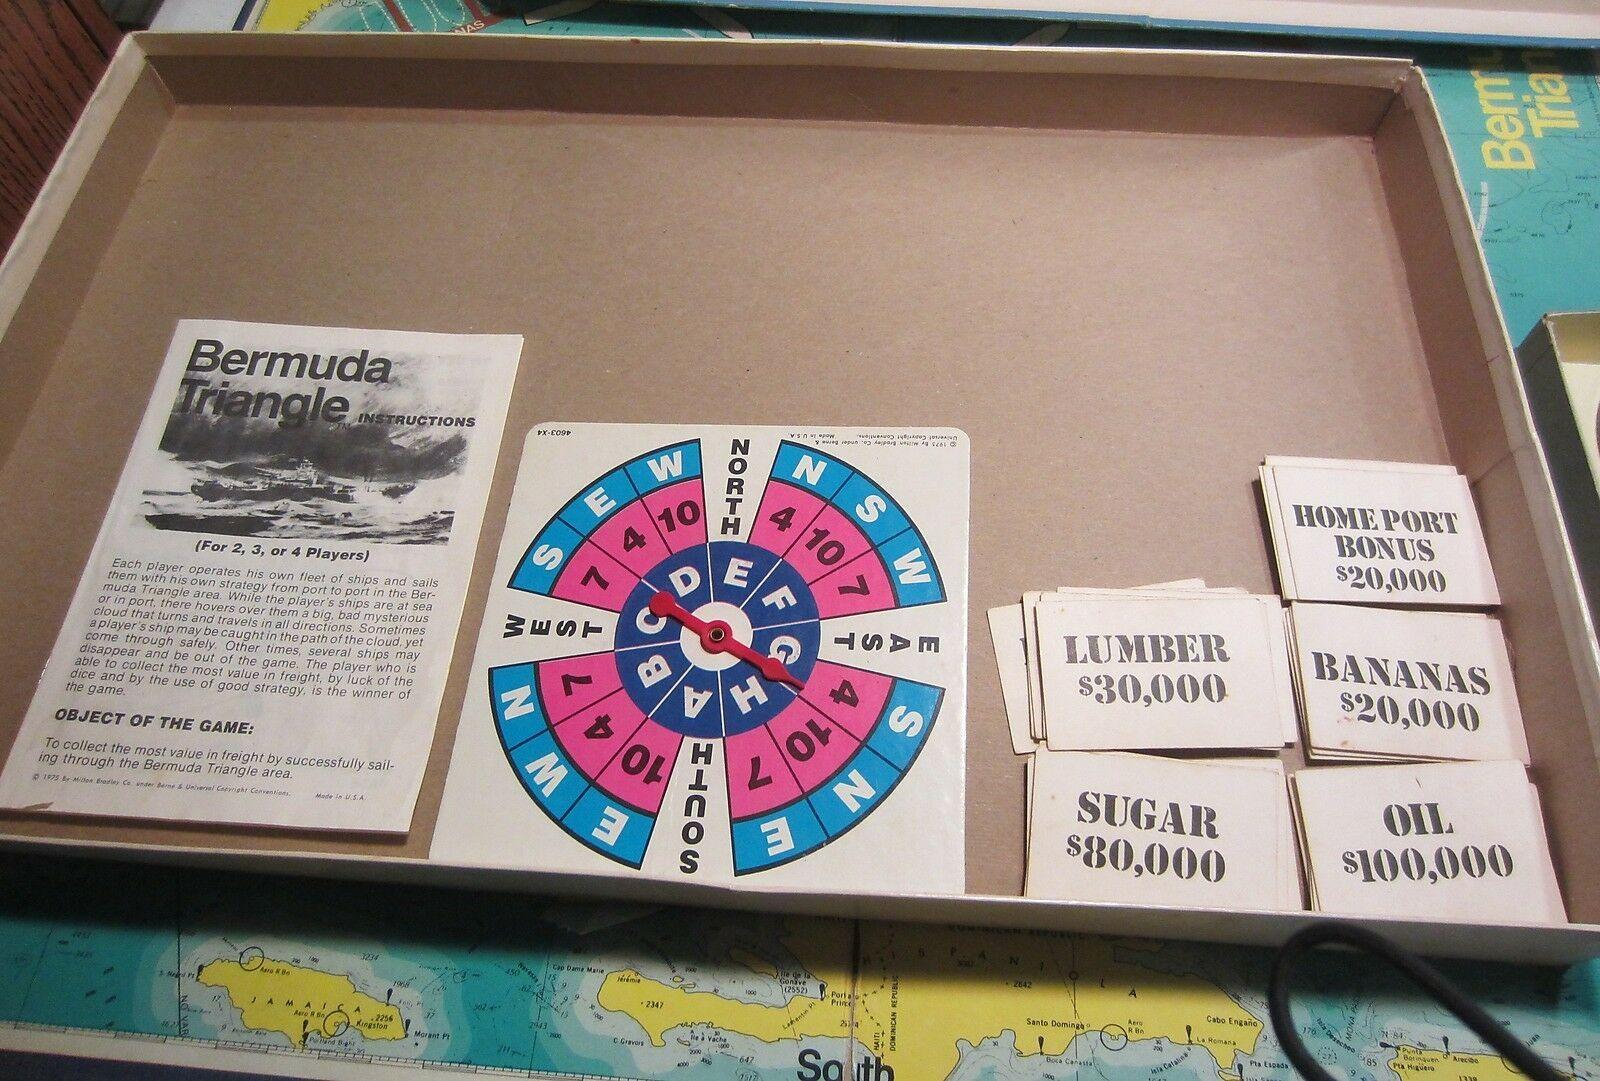 Vintage  Bermuda Triangle board game - complete image 4